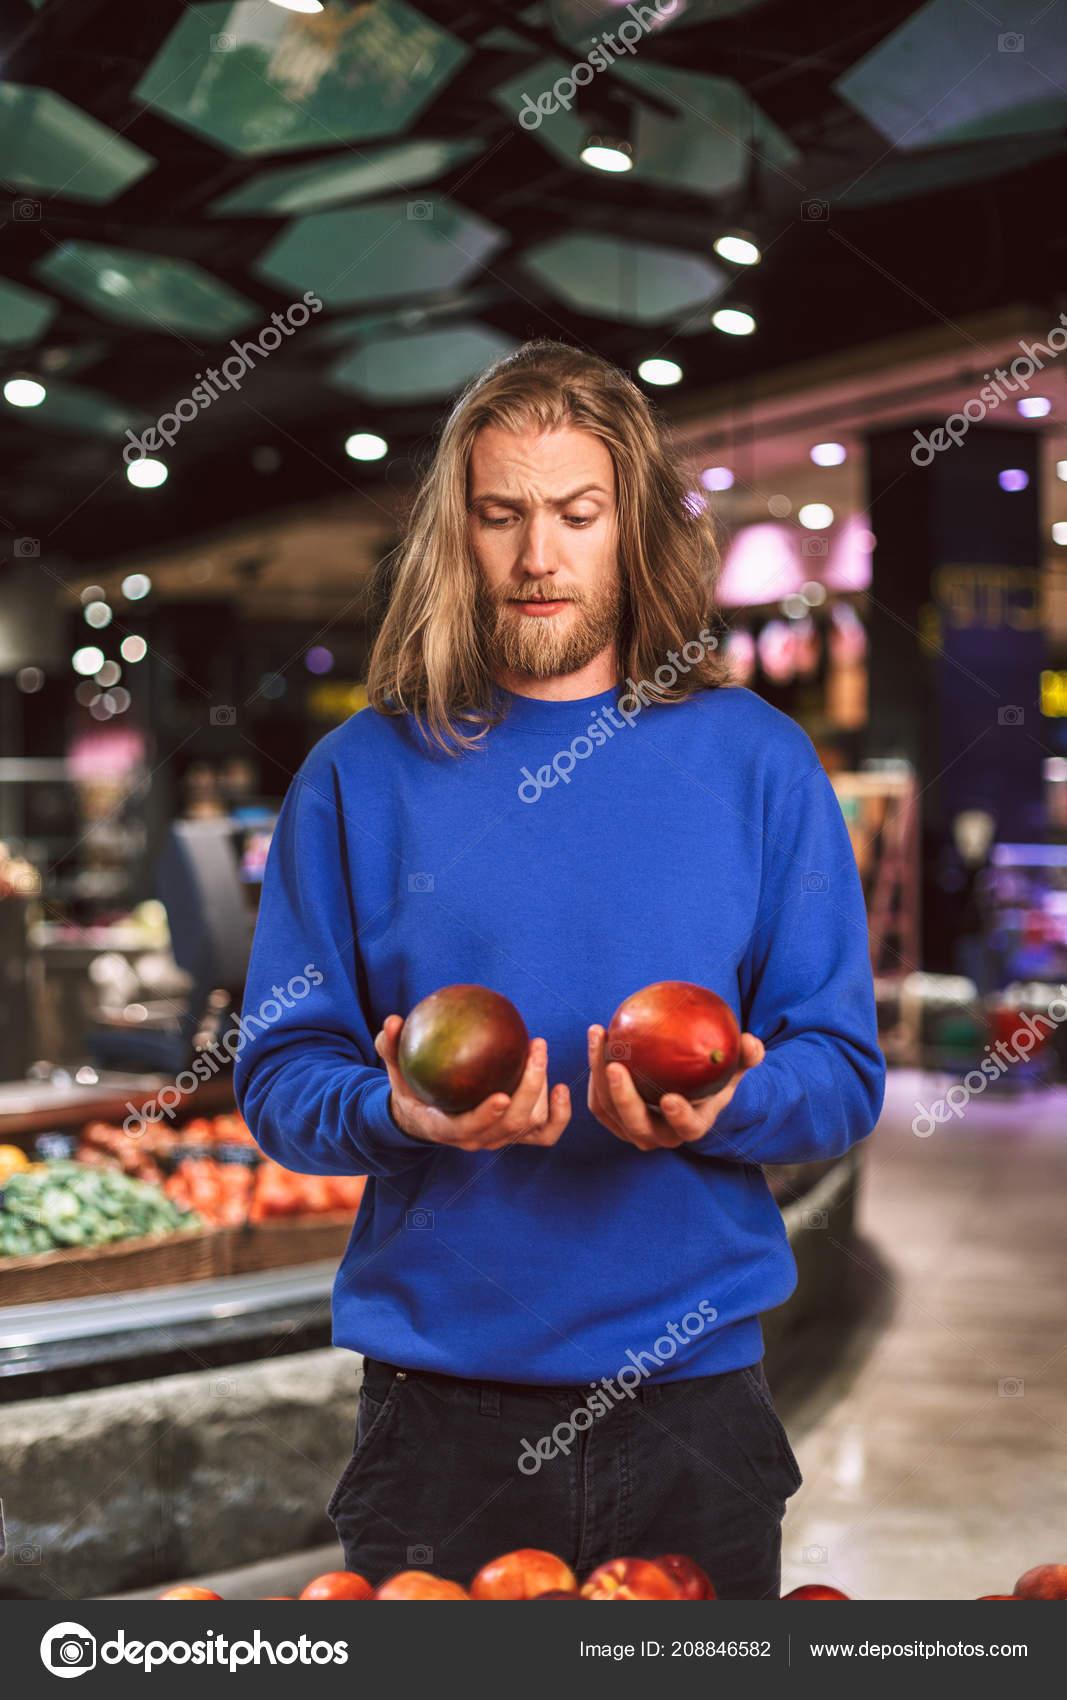 Mango Trui.Jonge Man Donker Blauwe Trui Zorgvuldig Zoek Mango Hand Moderne